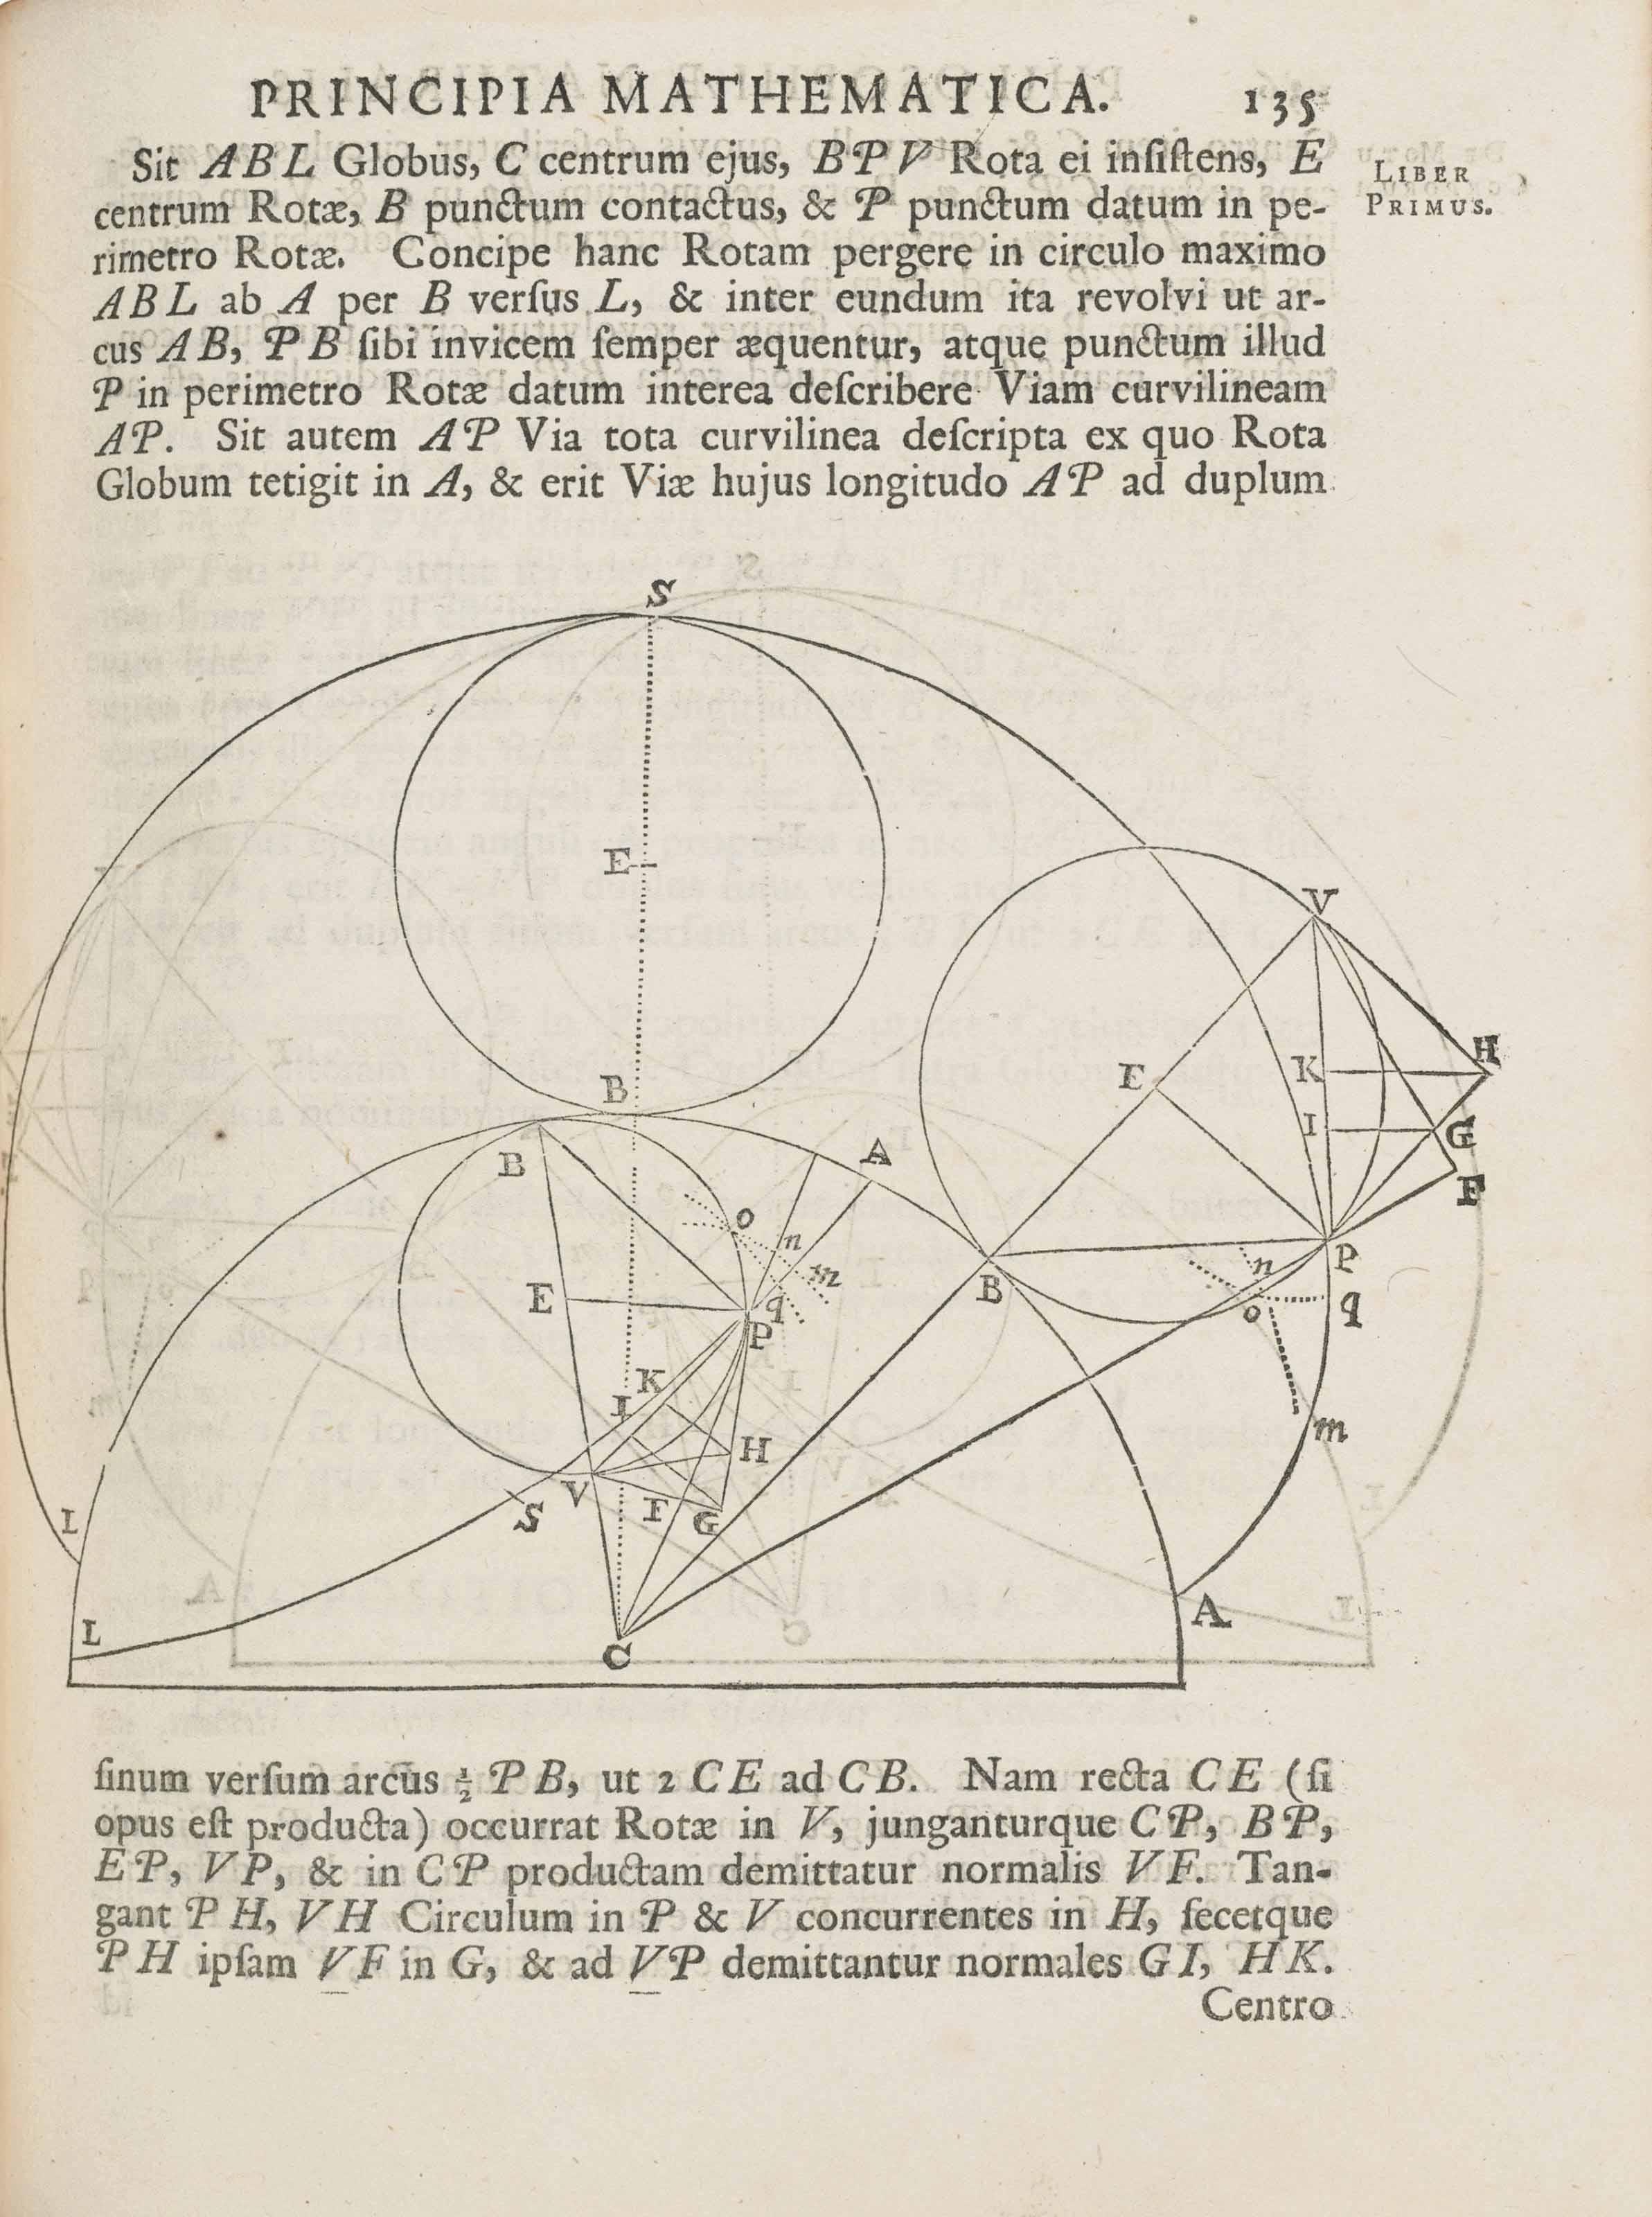 NEWTON, Sir Isaac (1642-1727). Philosophiae naturalis principia mathematica. Editio secunda, edited by Roger Cotes (1682-1716). Cambridge: [printed by Cornelius Crownfield at the University Press], 1713.